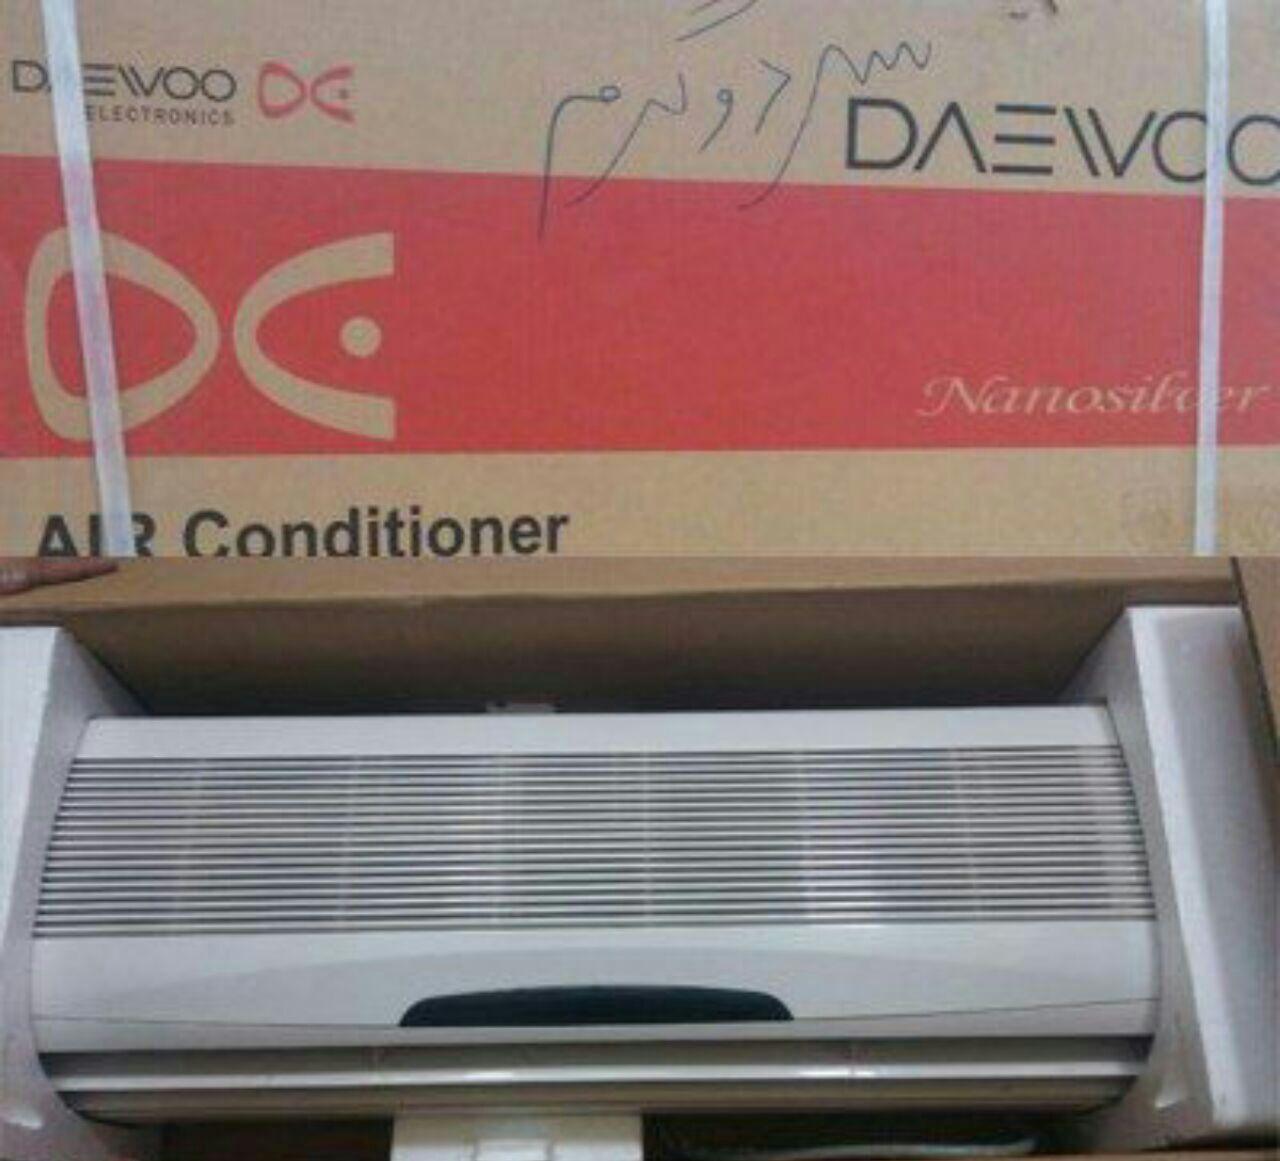 کولر گازی دوو daewoo مونتاژ کره  کم مصرف موتور پرقدرت هزینه ارسال رایگان